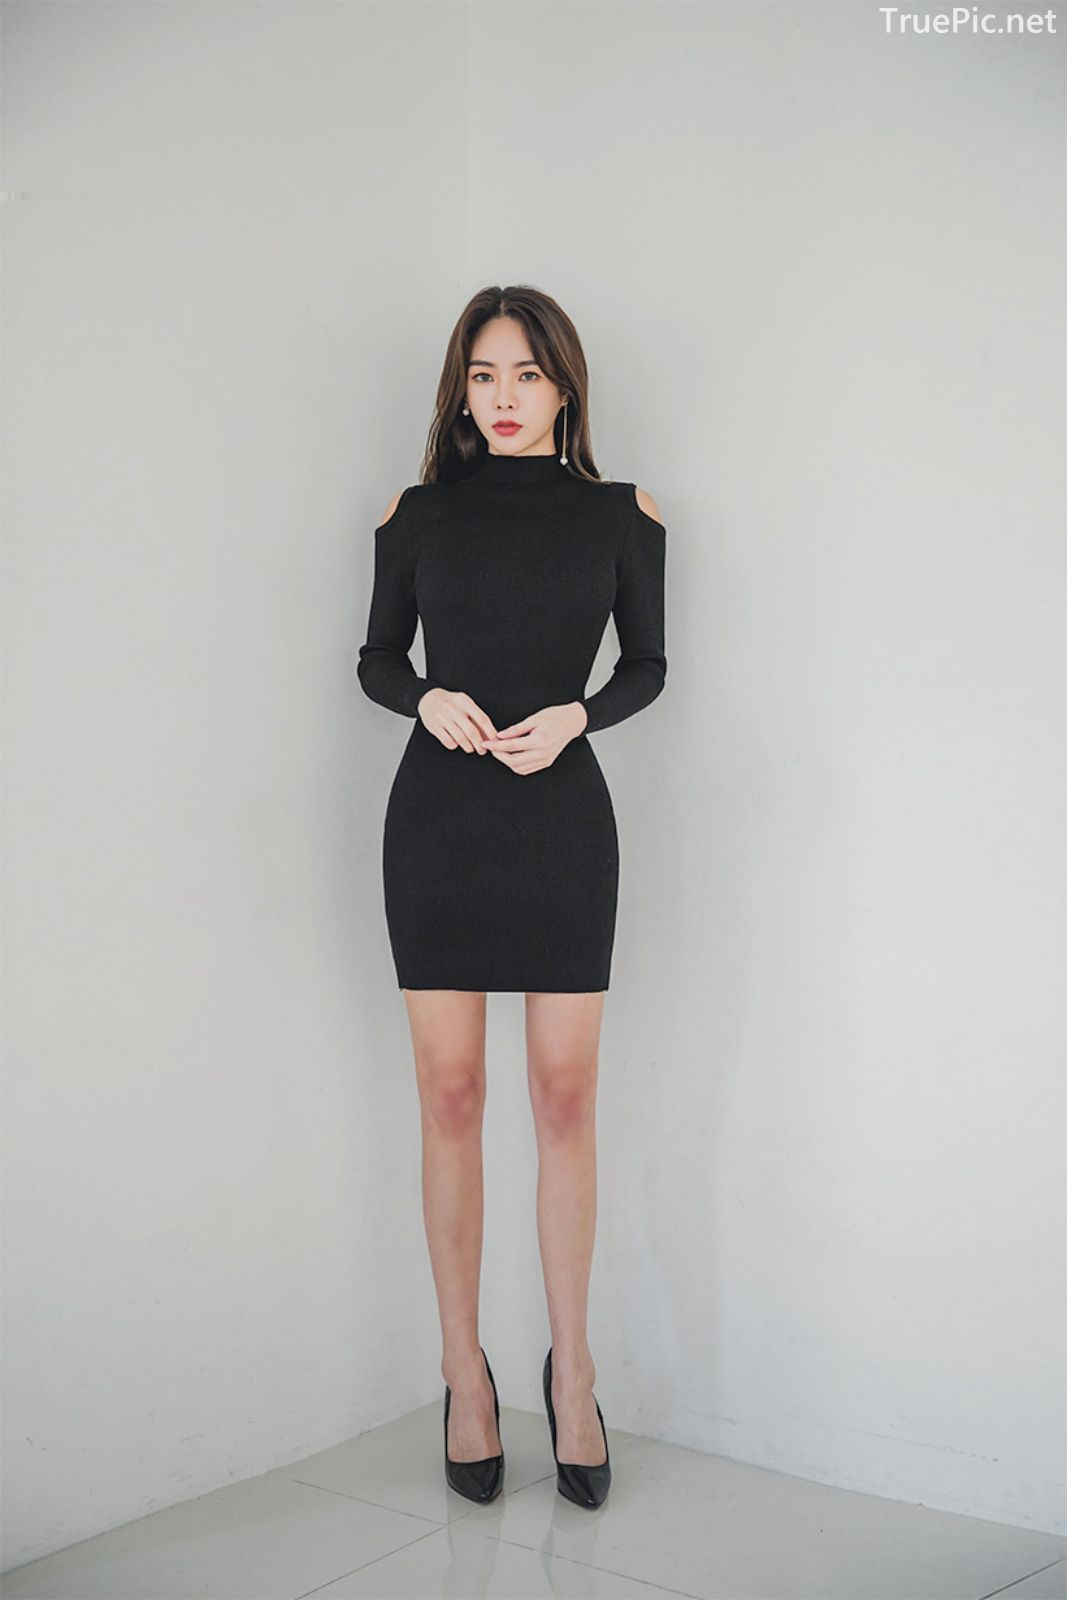 Korean fashion model - An Seo Rin - Woolen office dress collection - TruePic.net - Picture 9